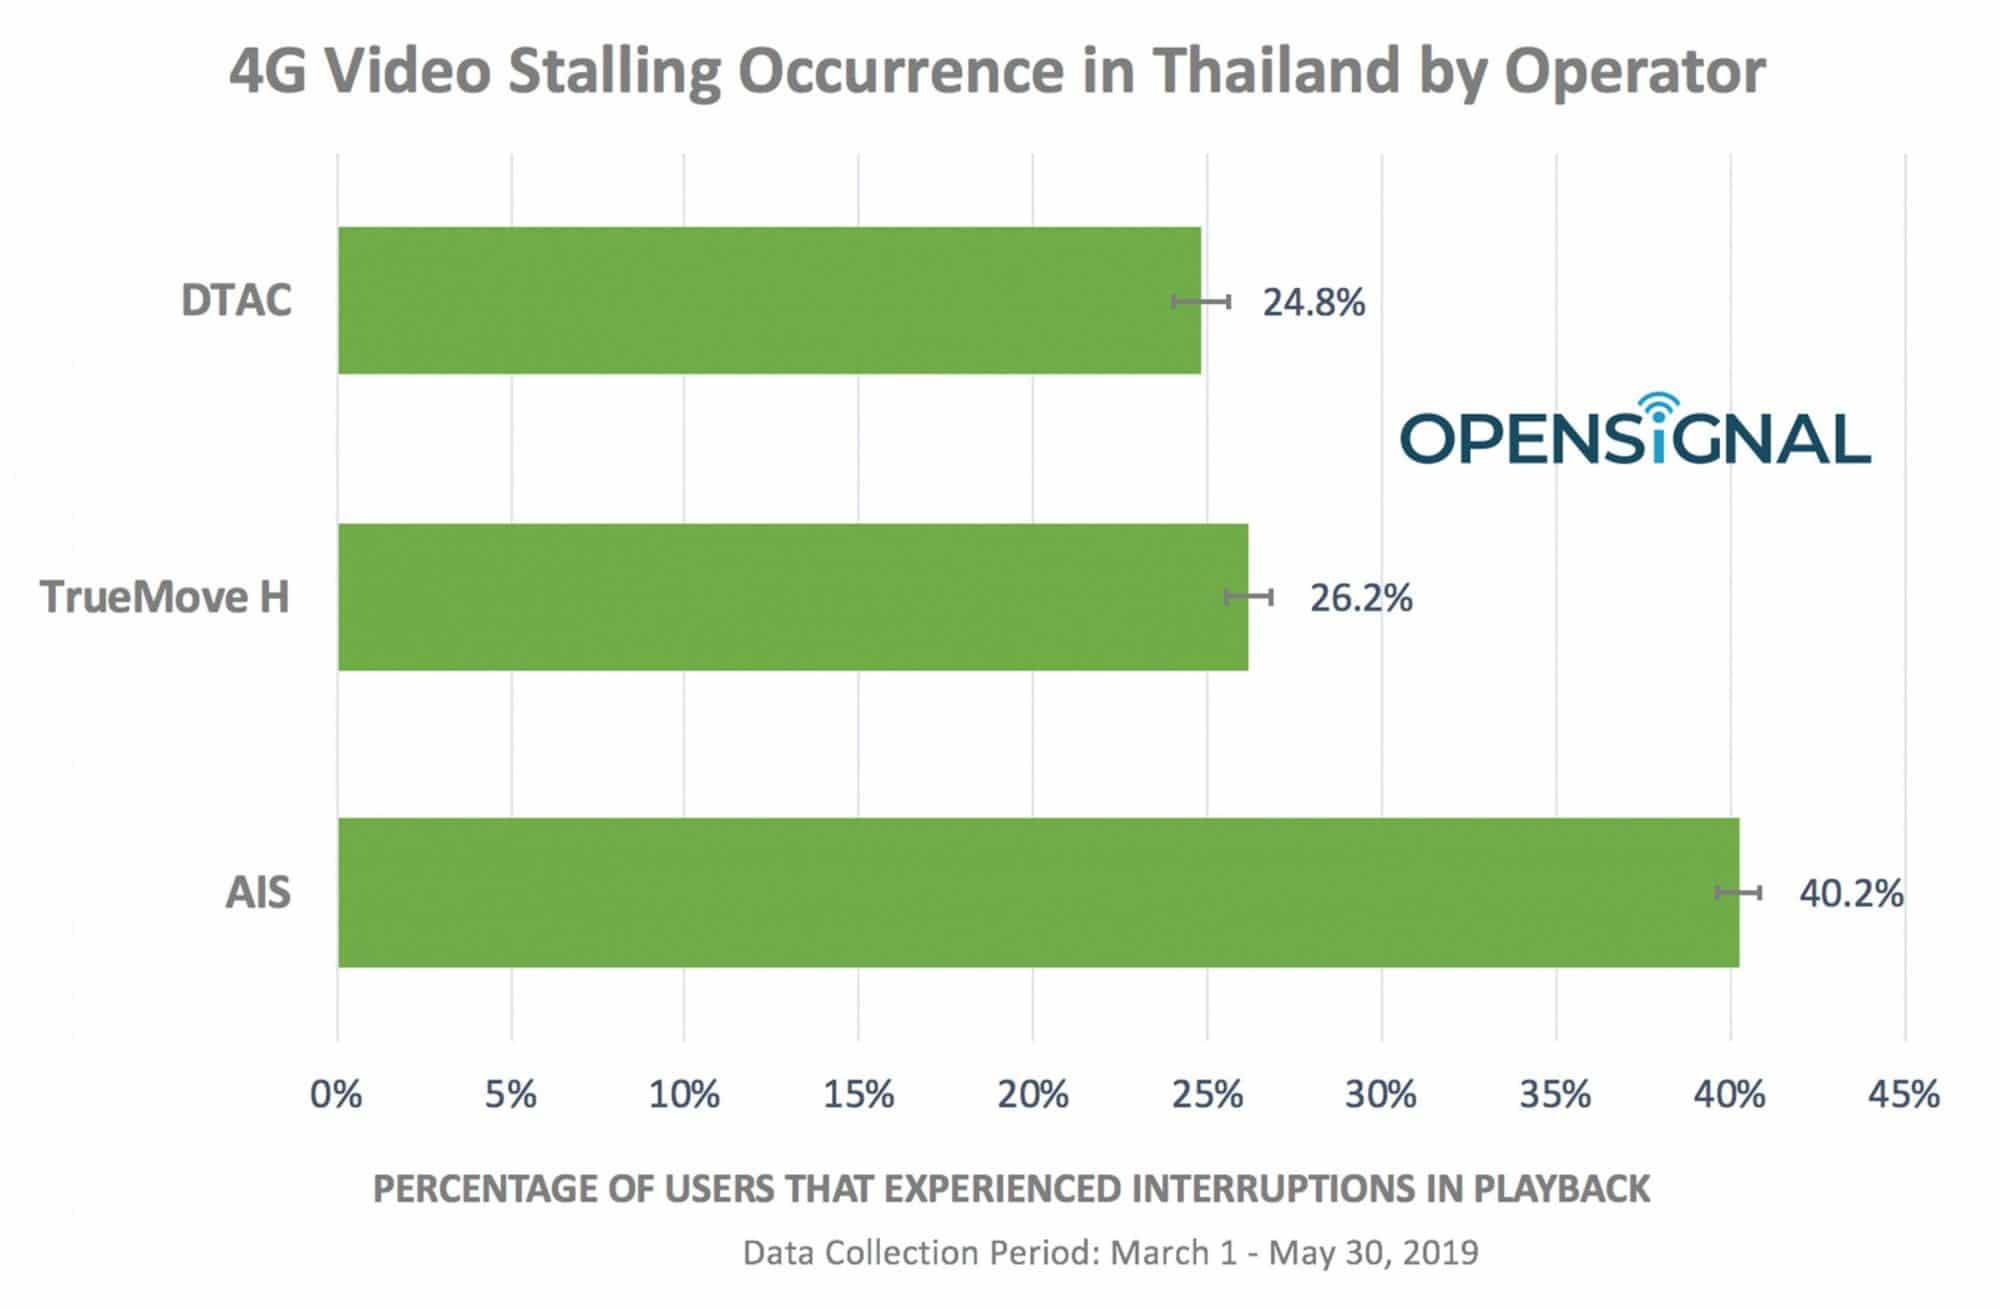 Opensignal เผยอินเทอร์เน็ตมือถือไทยมีปัญหาในการสตรีมวิดีโอ 3